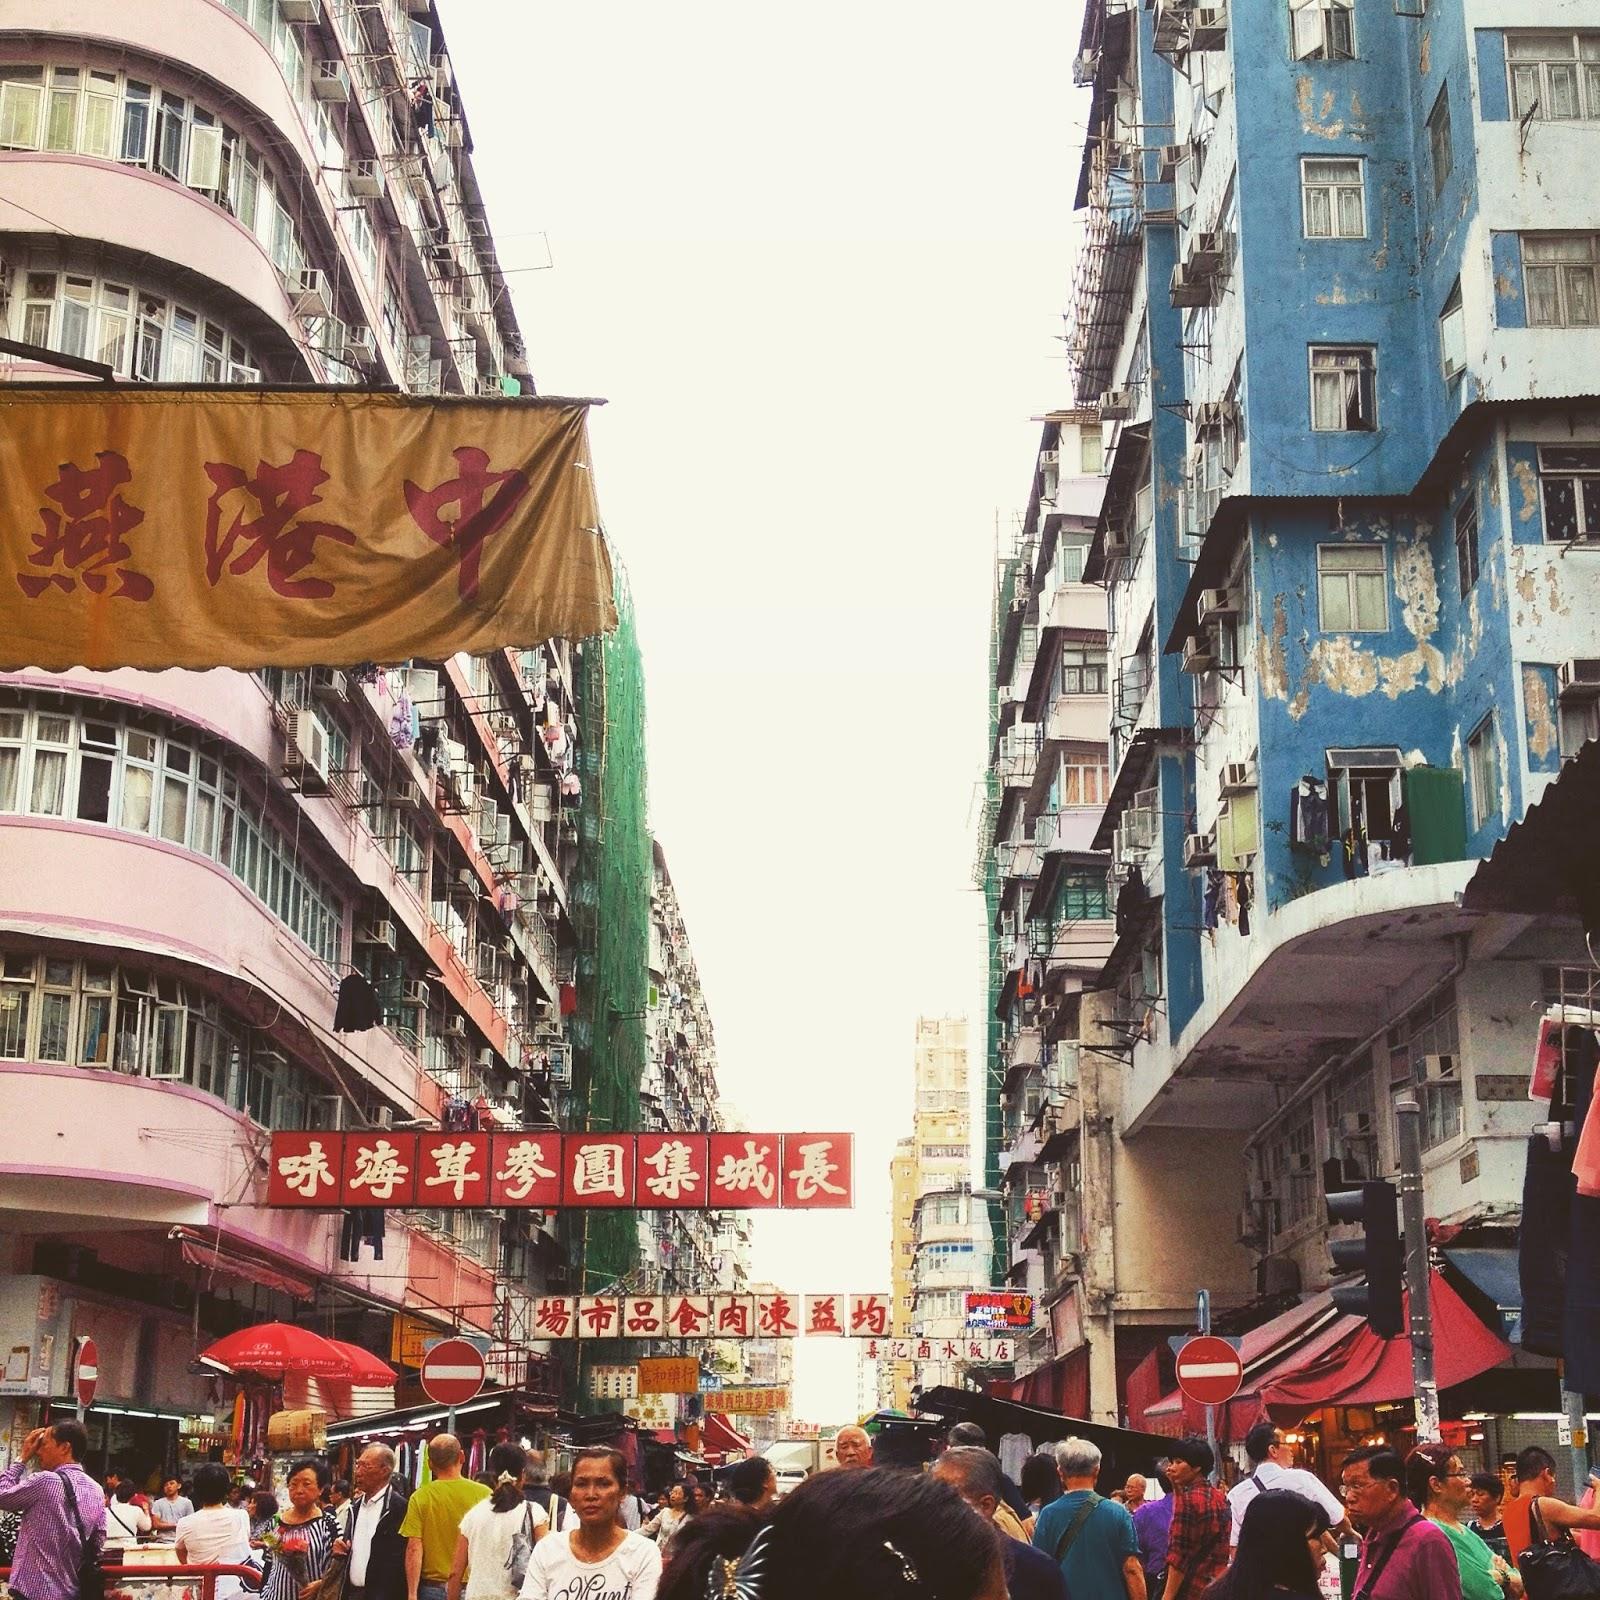 yiweilim, yiwei lim, yi wei lim, yiwei lim blog, sham shui po, market, apliu street, street photography, hong kong, hong kong street photography, kowloon, apliu, flea market